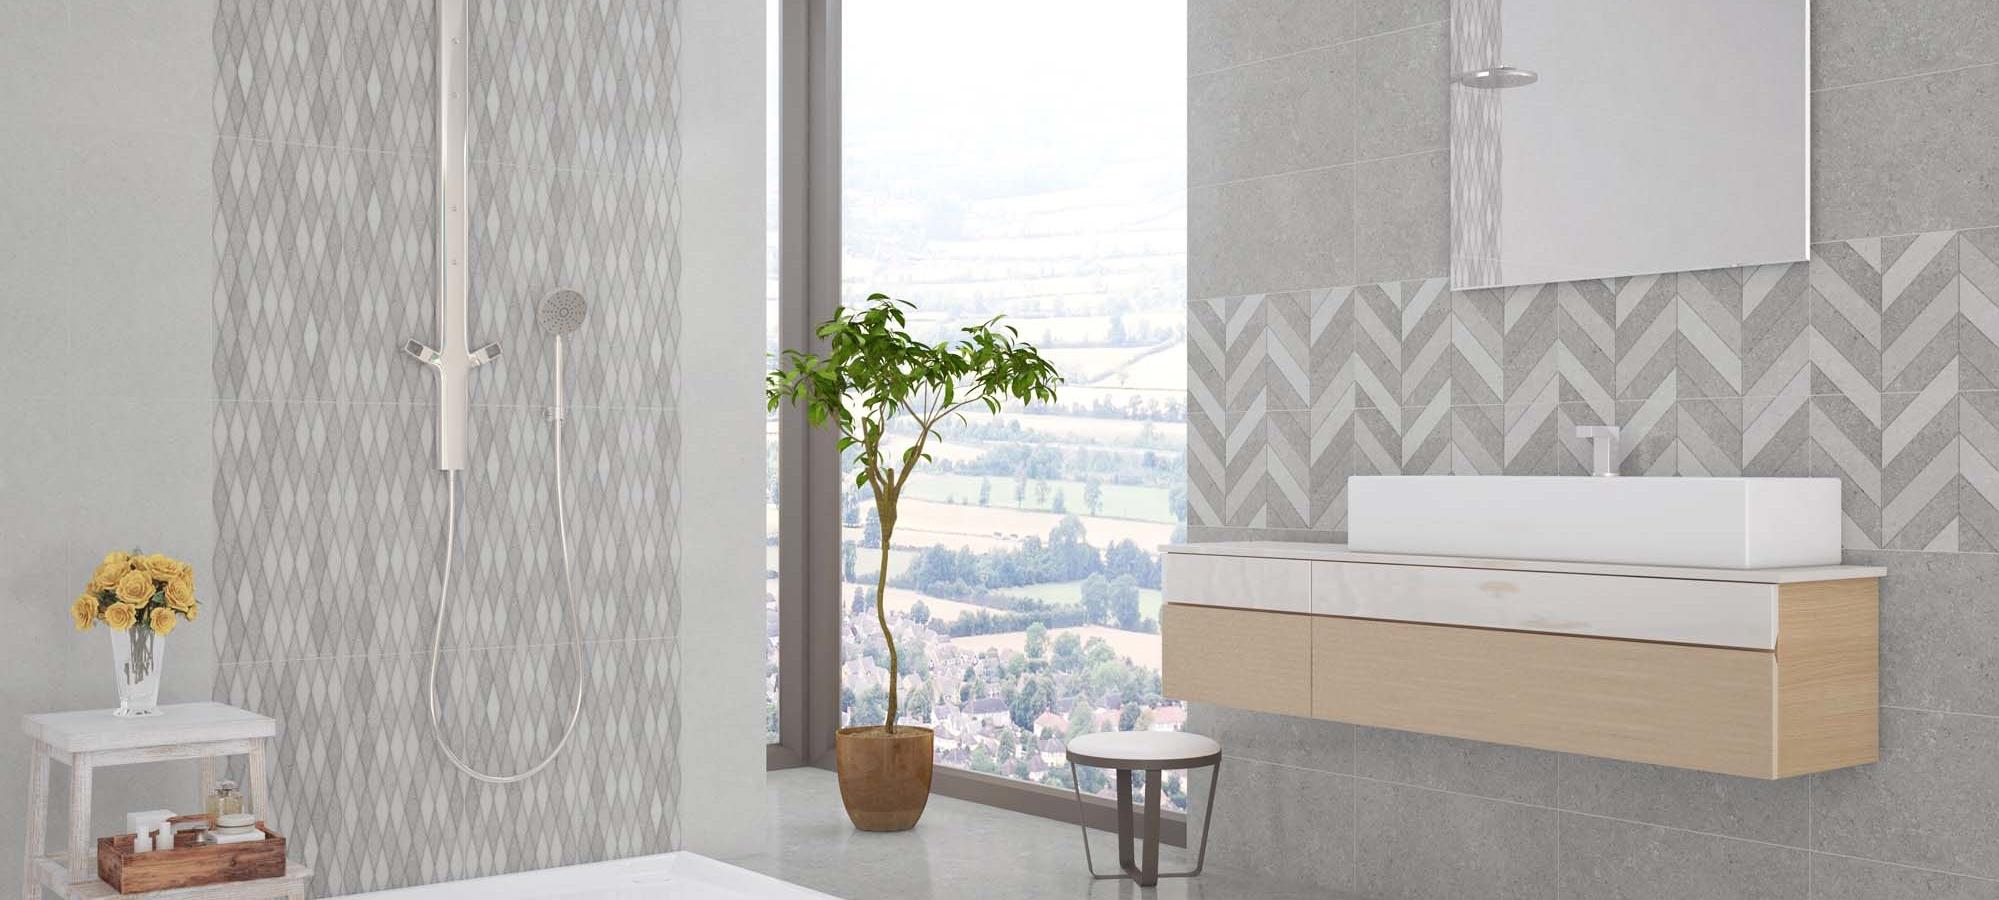 <span style='text-shadow: 0px 0px 8px black;'>Атрактивни декори за модерната баня.</span>